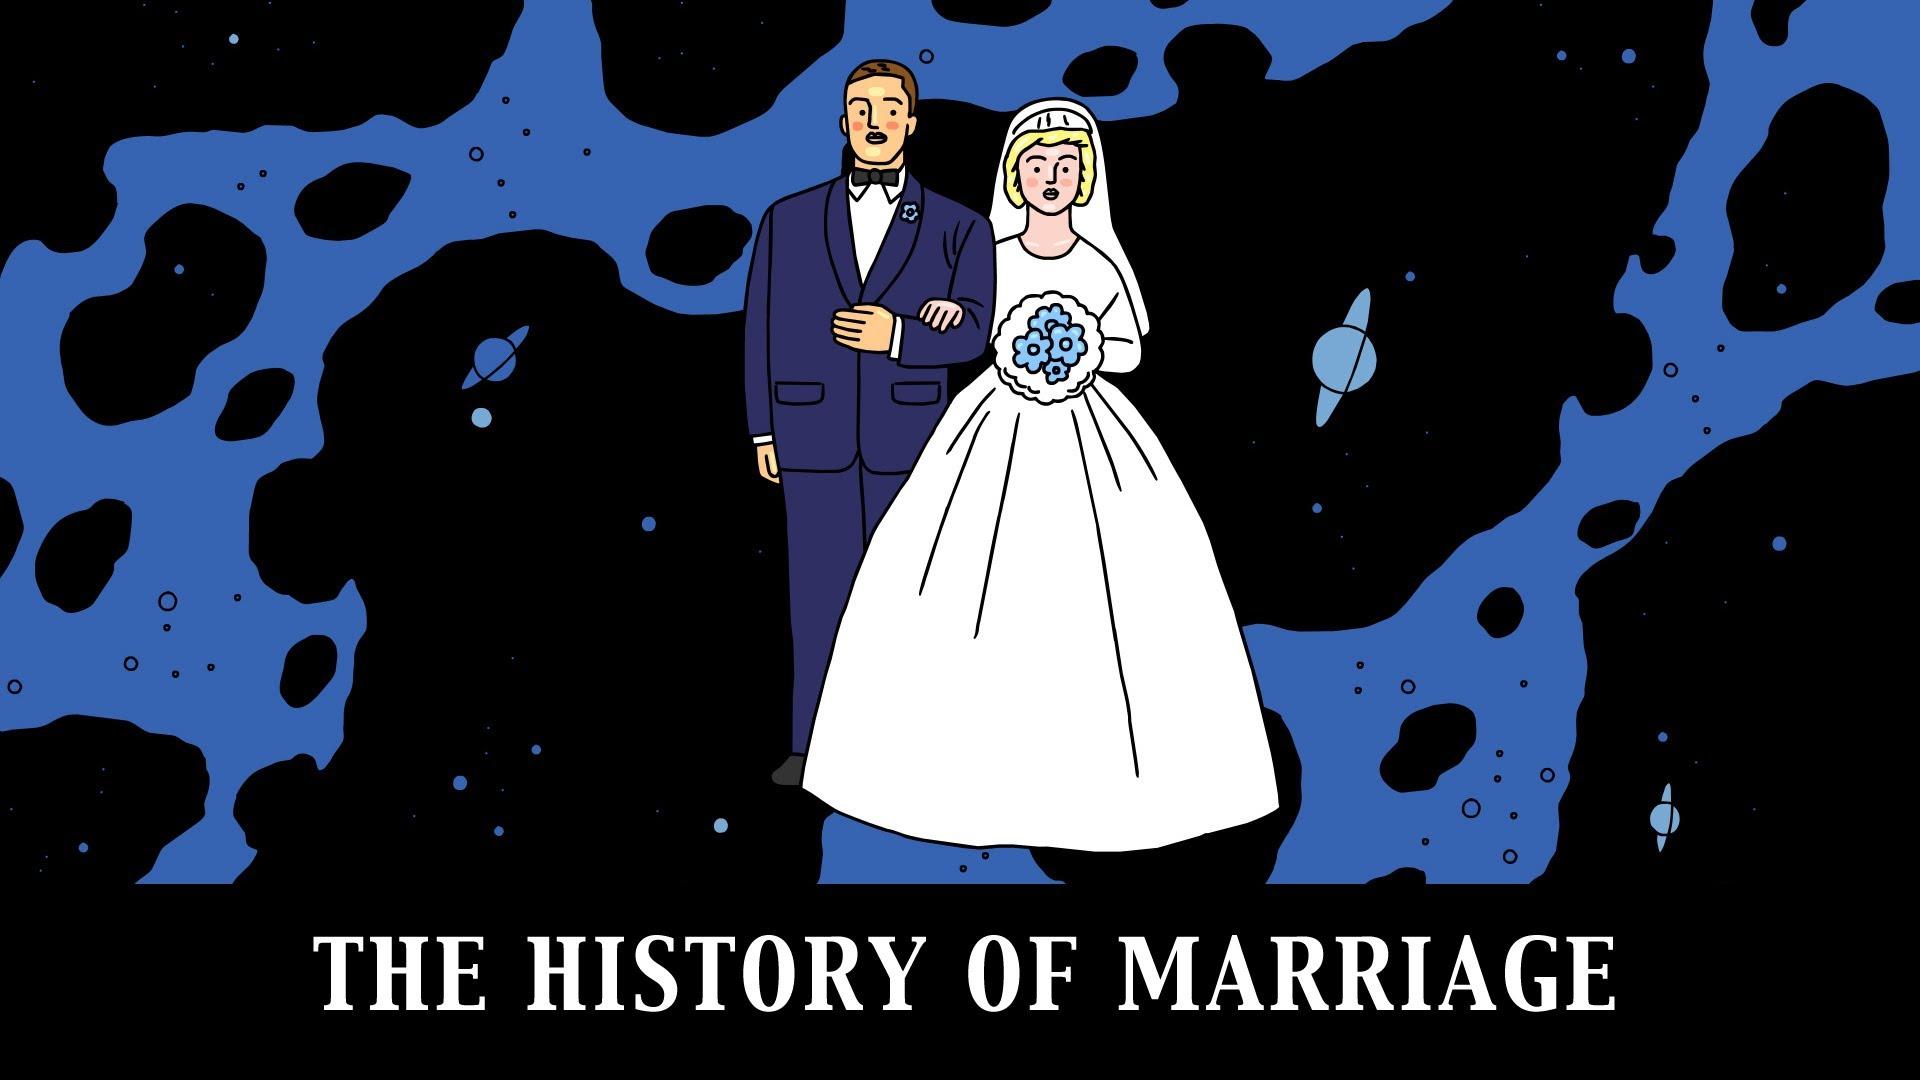 【TED-Ed】一妻多夫に、亡霊との結婚!?結婚の歴史